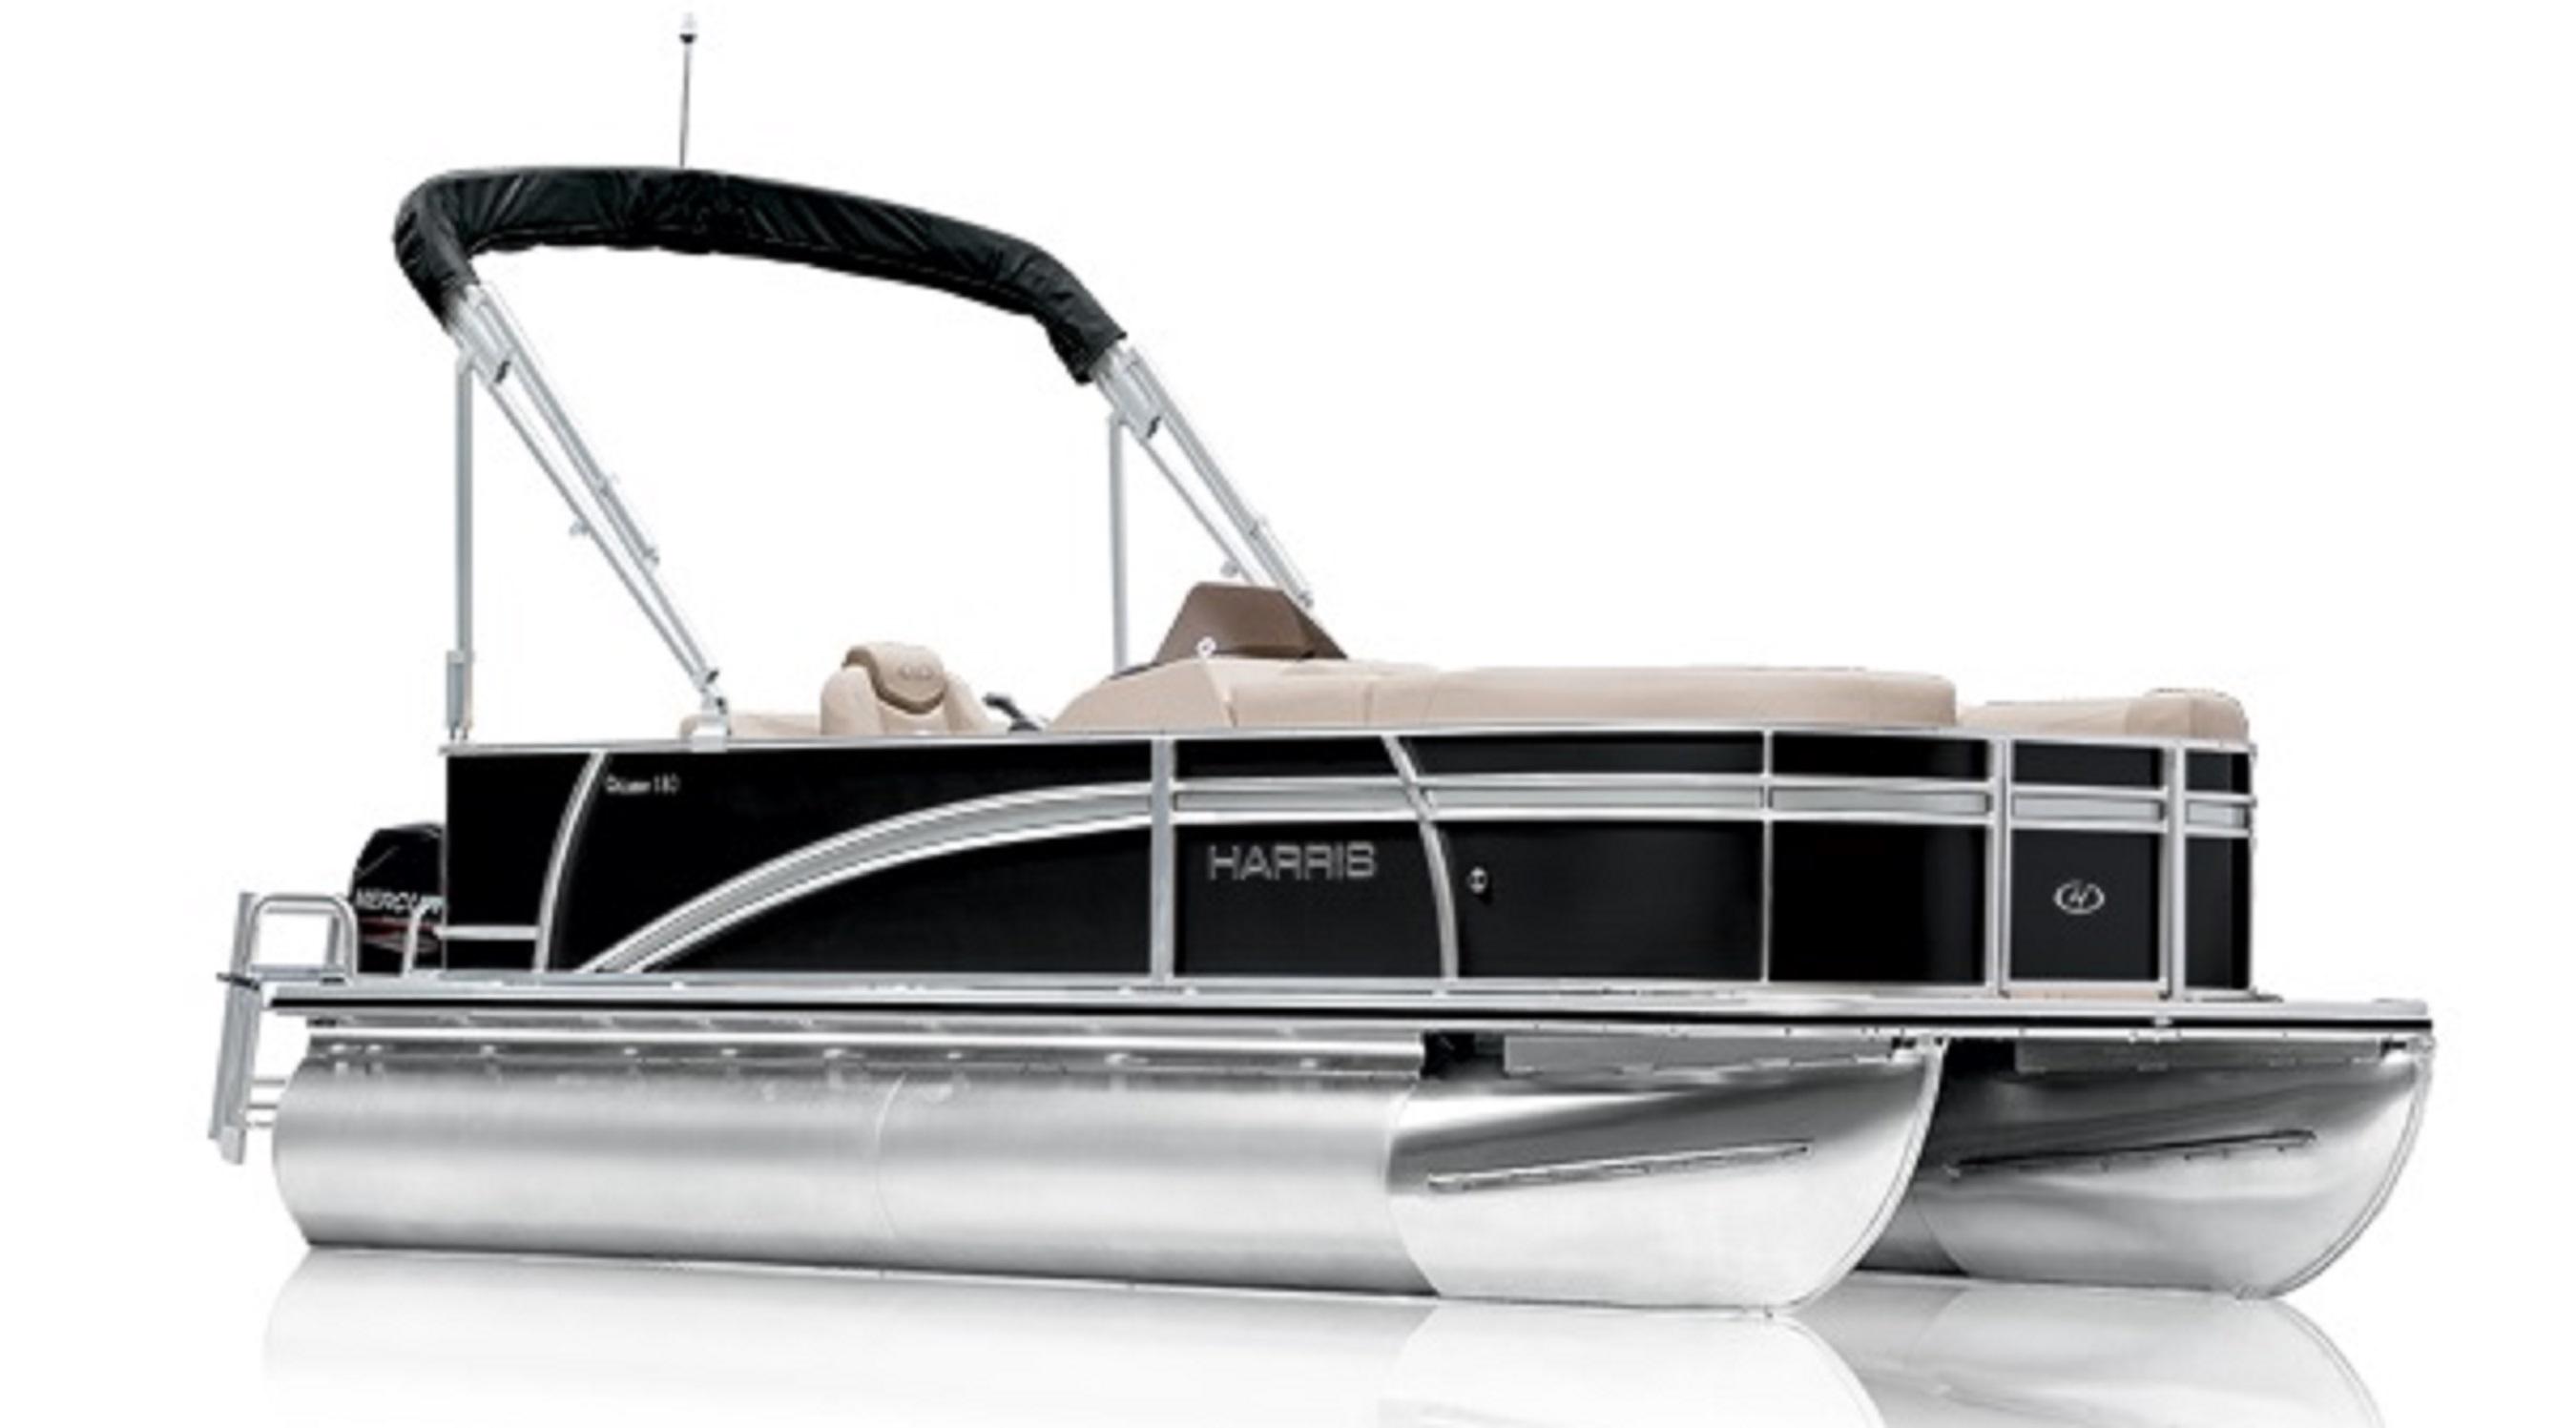 Harris Cruiser 220 CW